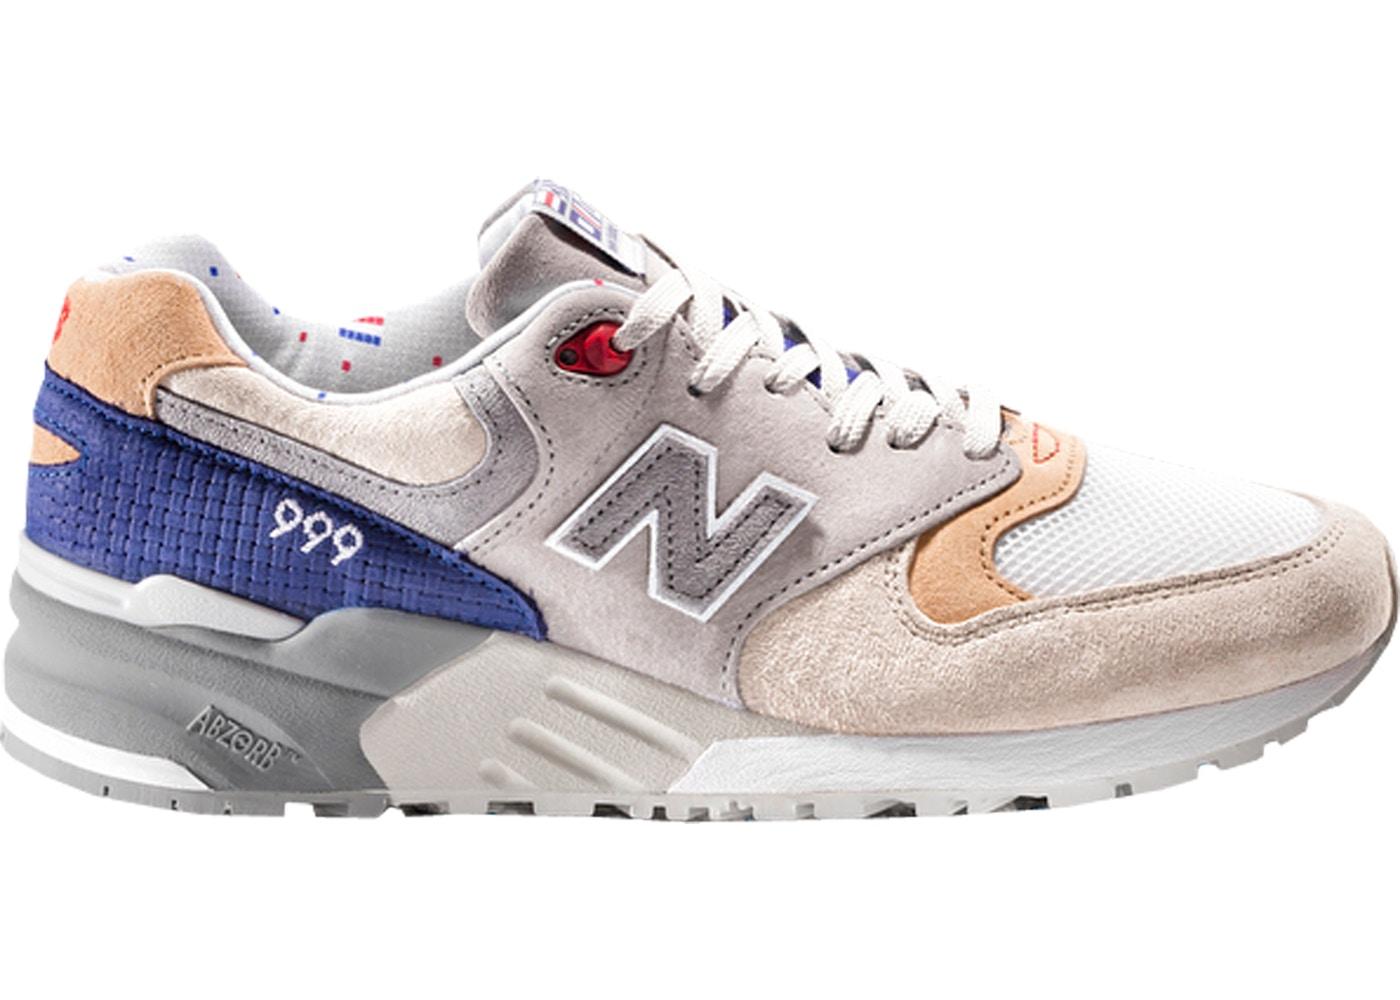 New Balance Shoe Fit